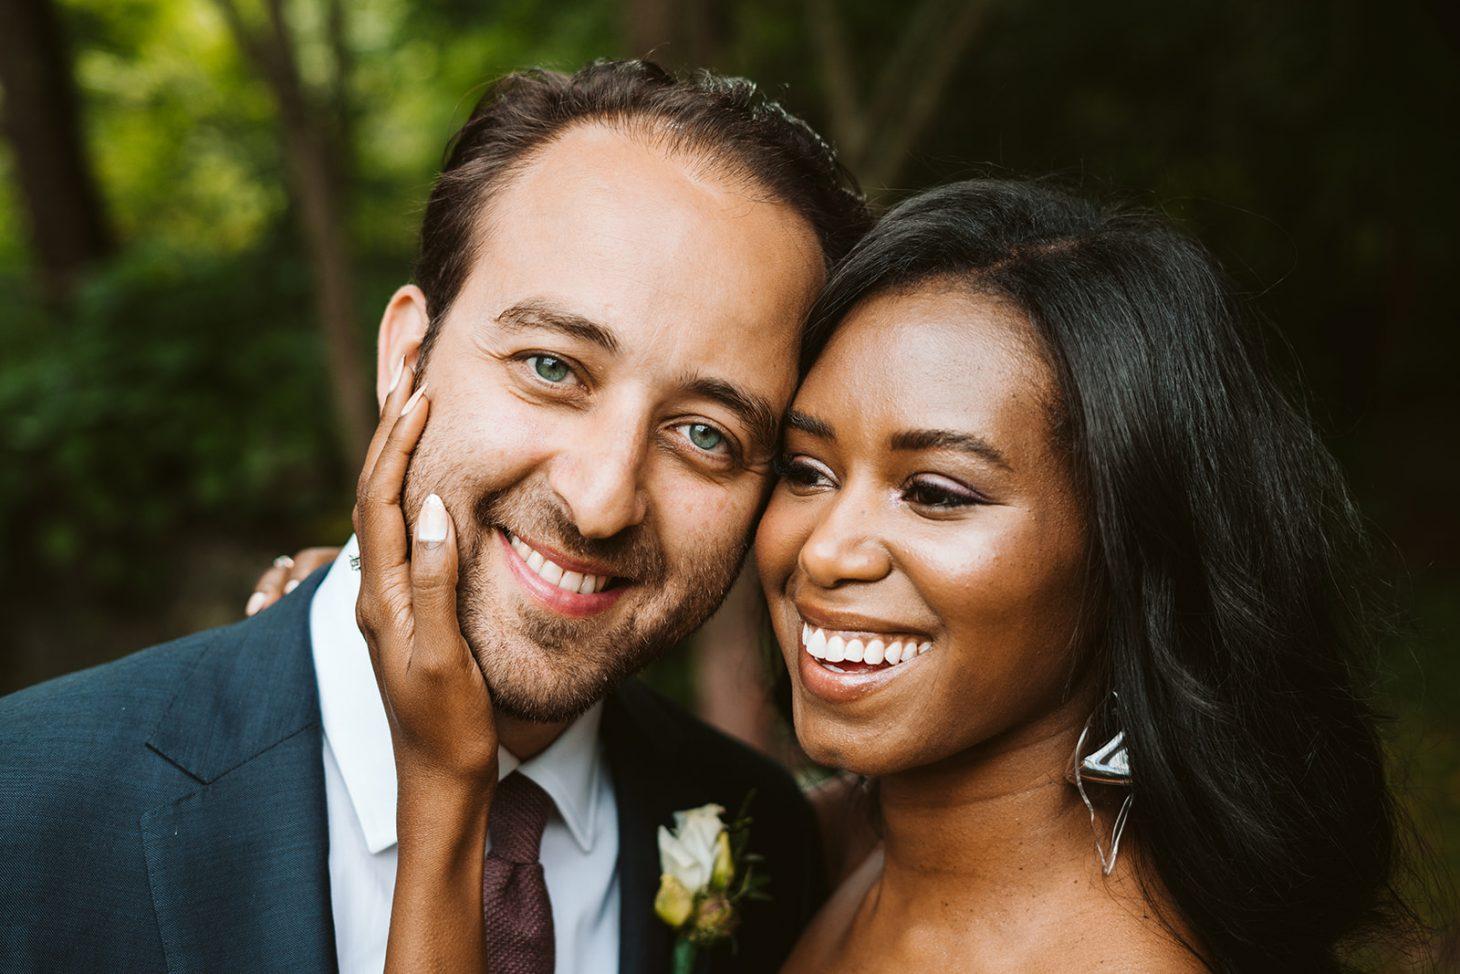 Catskills Wedding Photographer, North Branch Inn Wedding, Wedding at the North Branch Inn, North Branch Inn Wedding Gallery